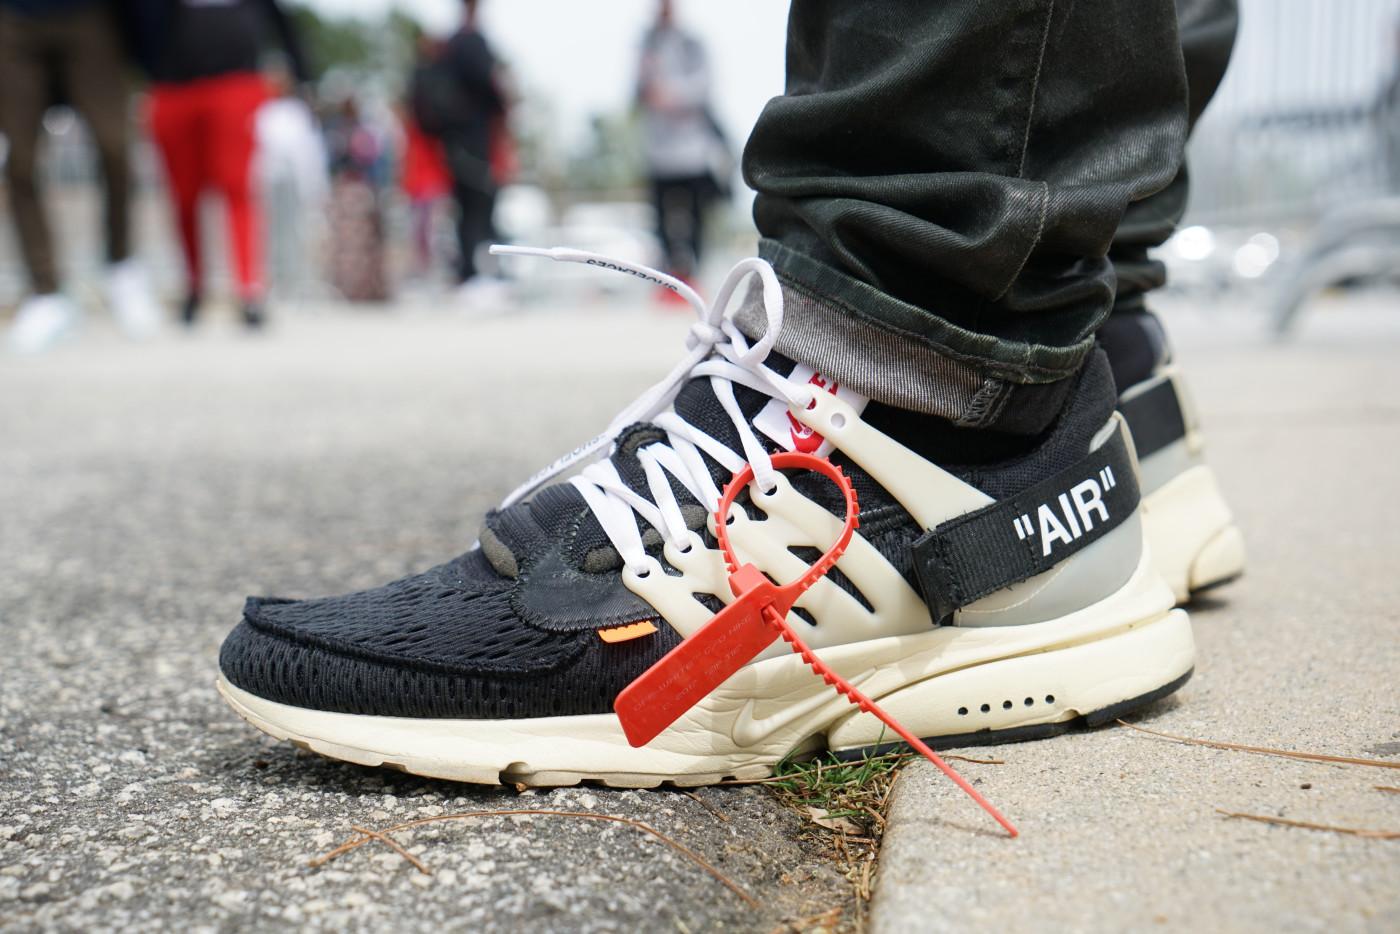 Best Sneakers Huncho Day 2019 9